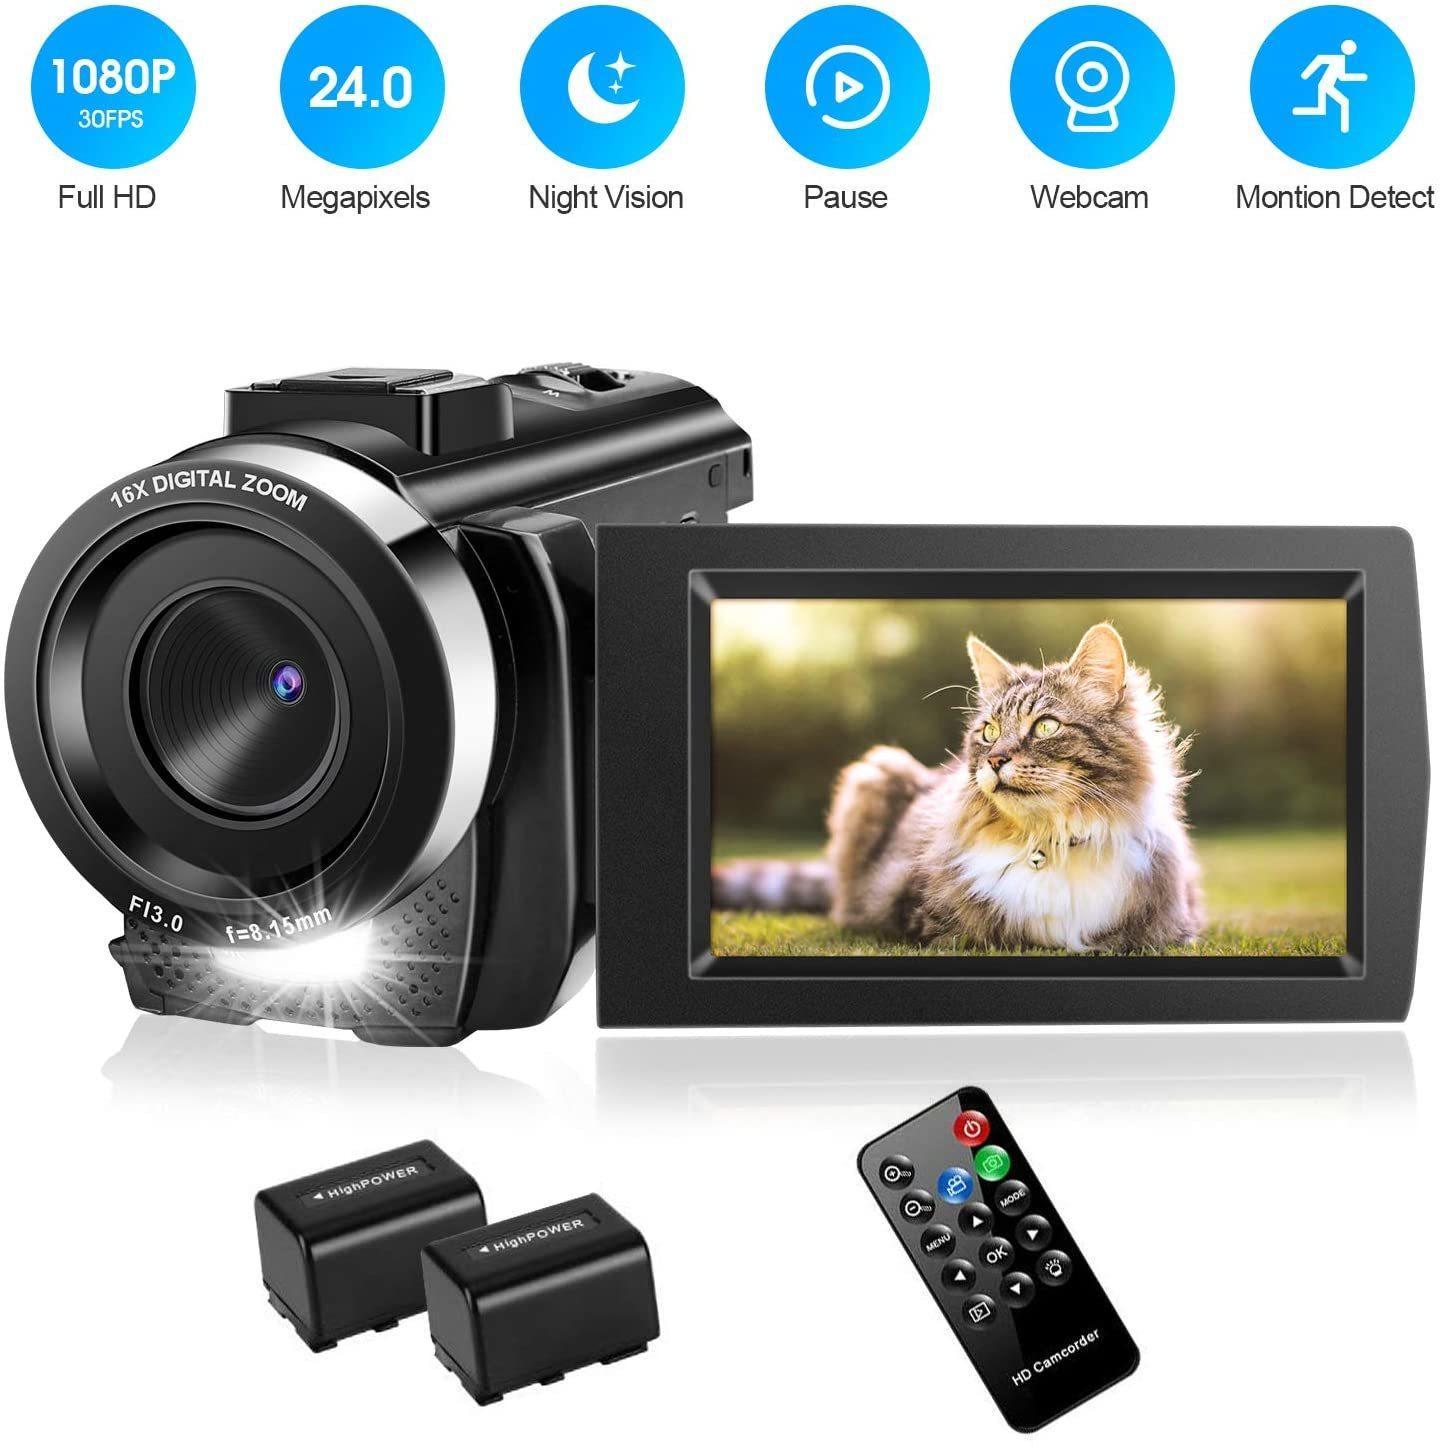 Video-Camcorder mit 32 GB-Karte Full HD 1080P 30FPS Digitale Vlogging Kamera für YouTube 3,0 Zoll LCD 270 Grad-IPS